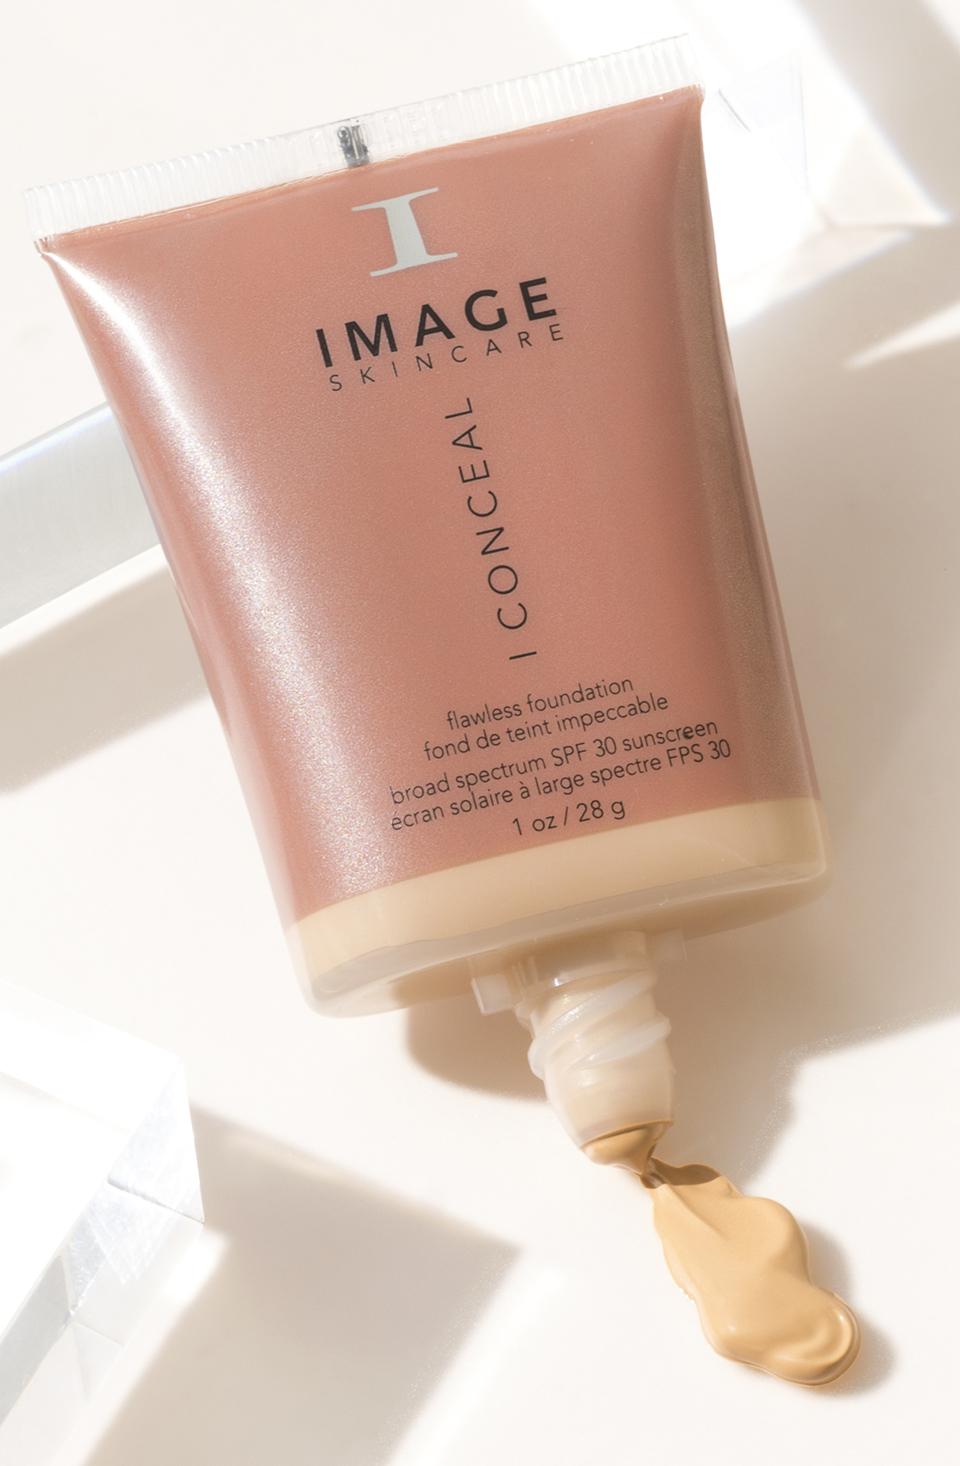 Image Skincare i Conceal mineral foundation